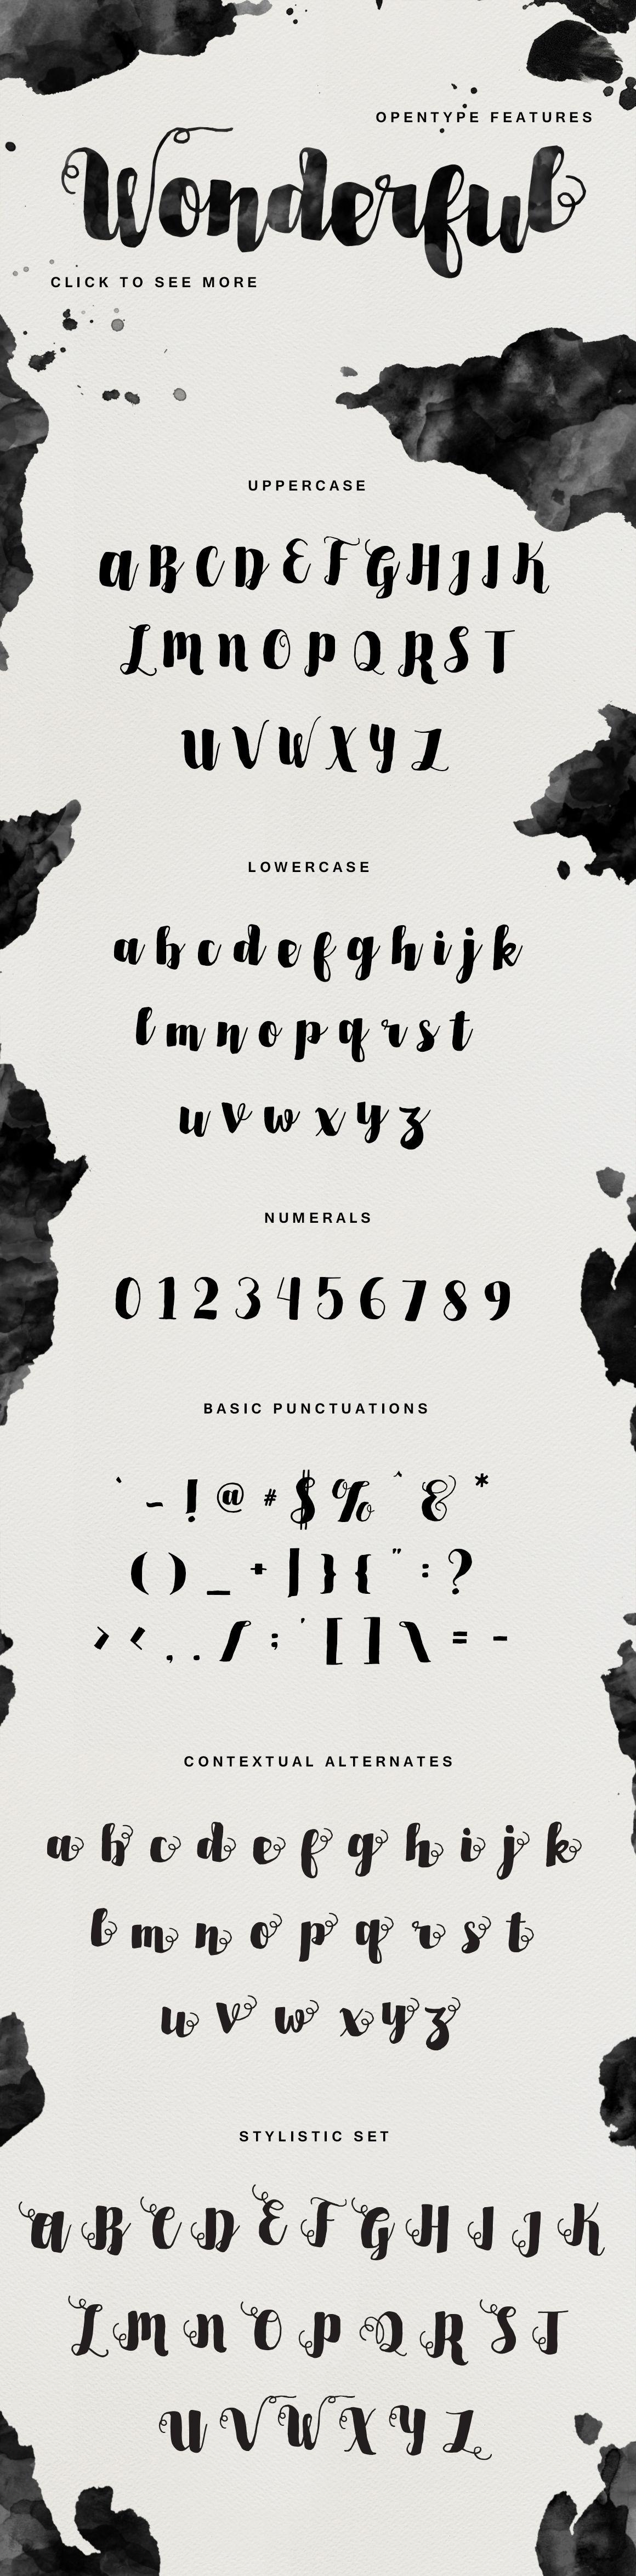 Sortdecai Brush Script by Swistblnk Design Std. on Creative Market